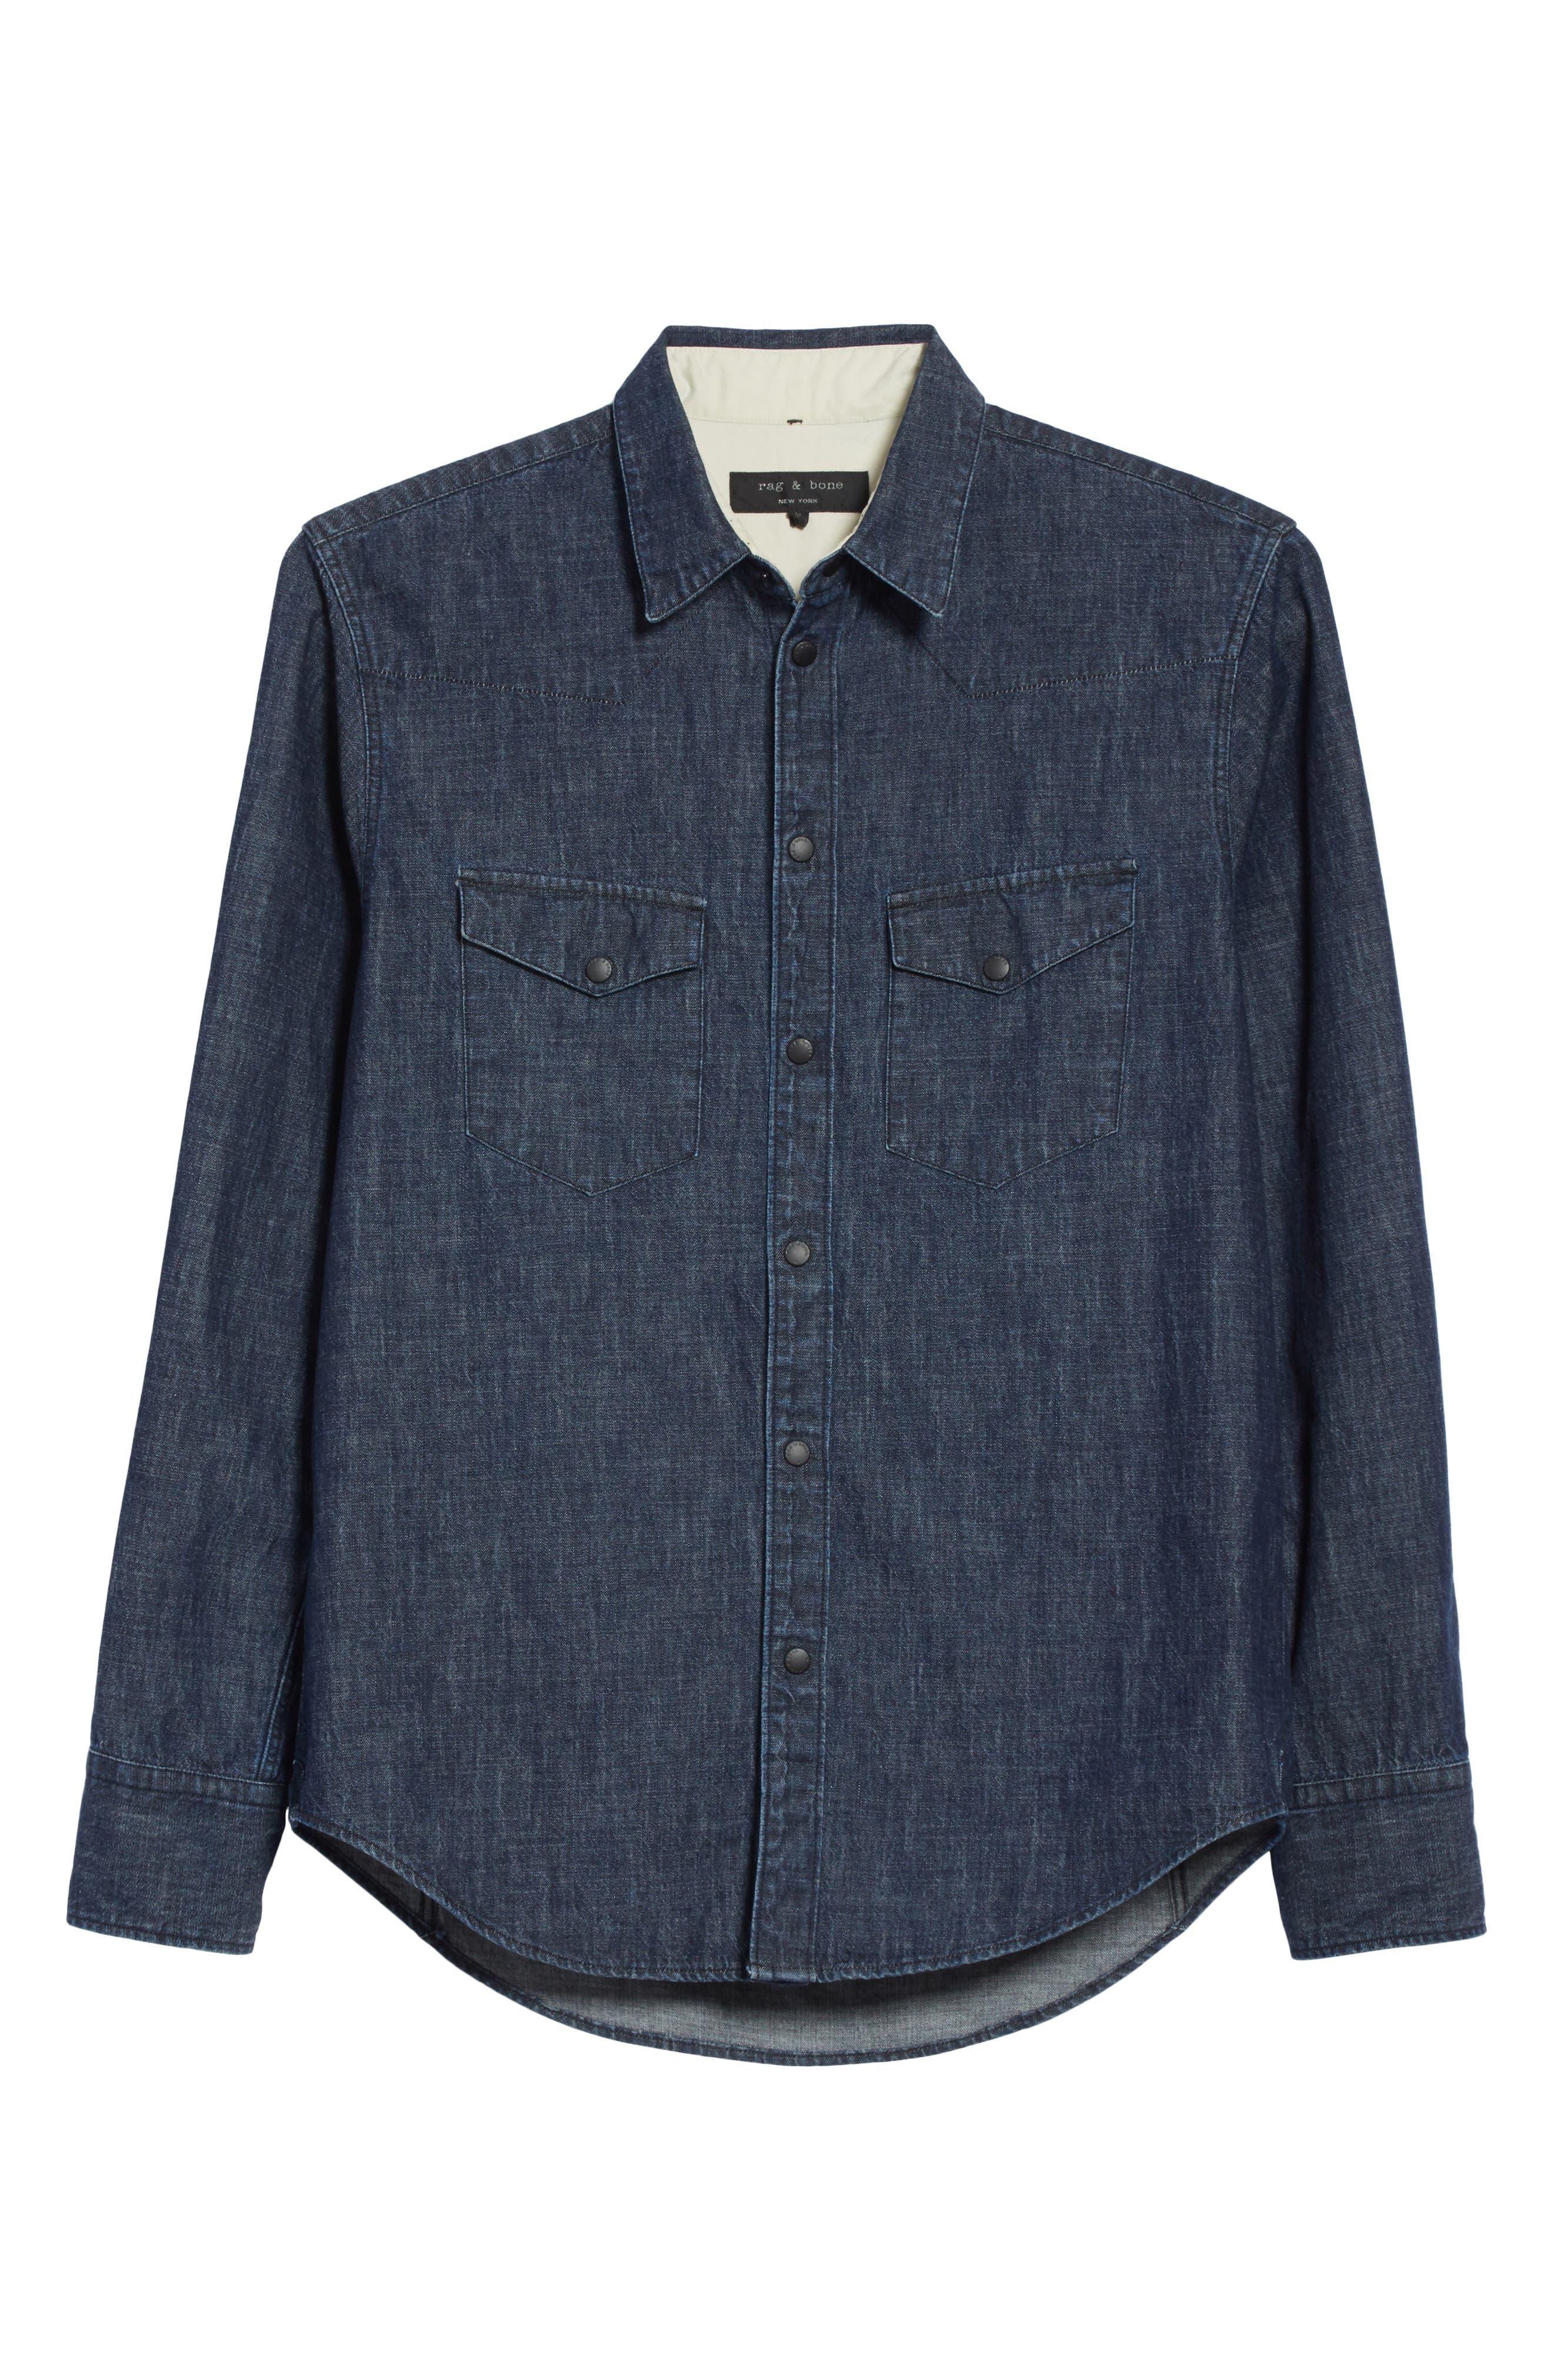 Beck Denim Shirt,                             Alternate thumbnail 6, color,                             470